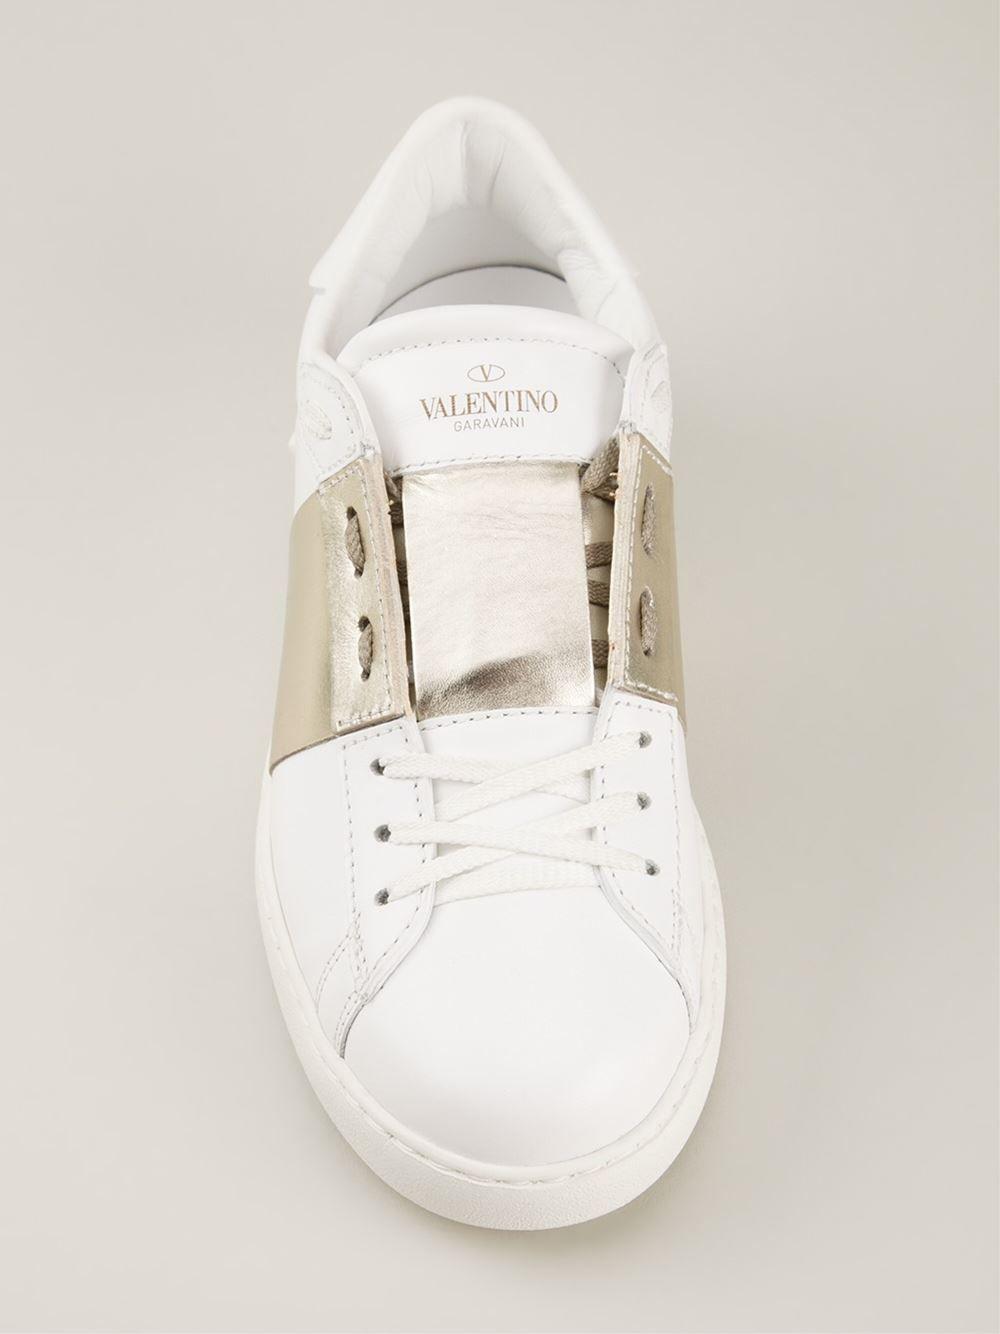 Valentino Top Garavani 'low Top Valentino Open' Sneakers Hirshleifers Farfetch dee1a6